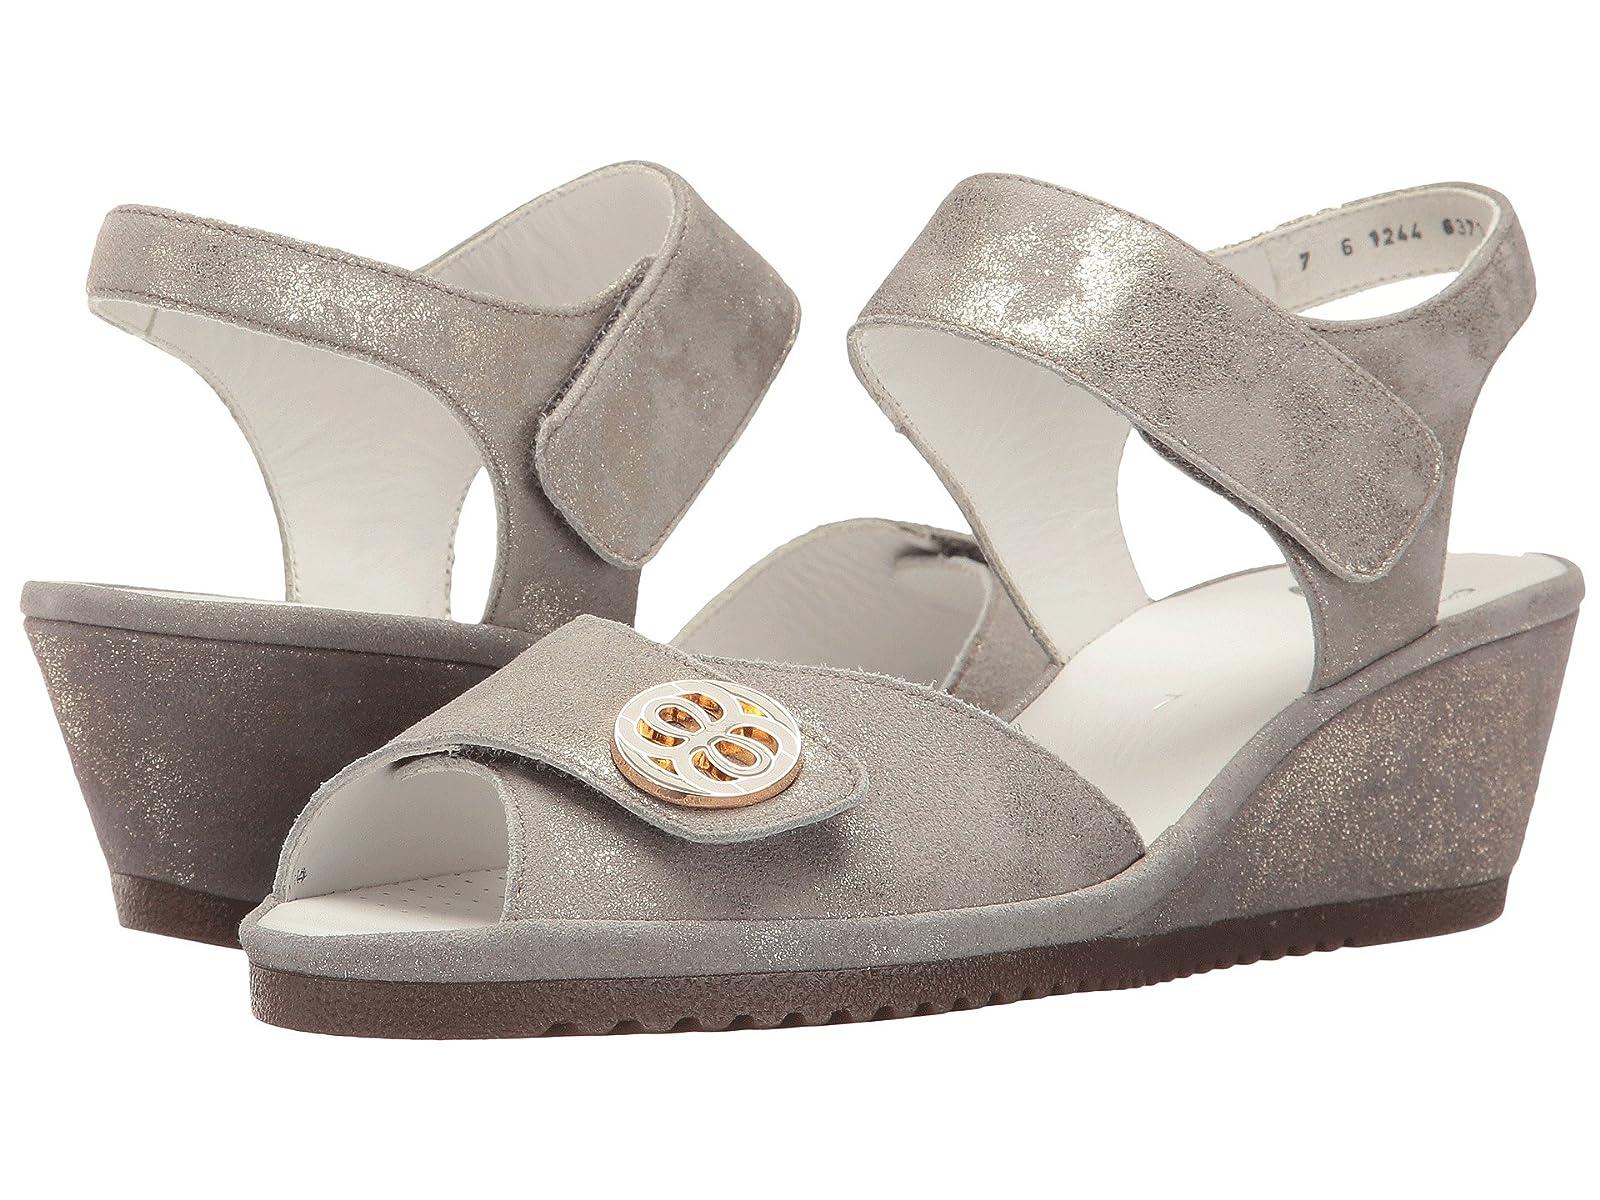 ara ClaraCheap and distinctive eye-catching shoes